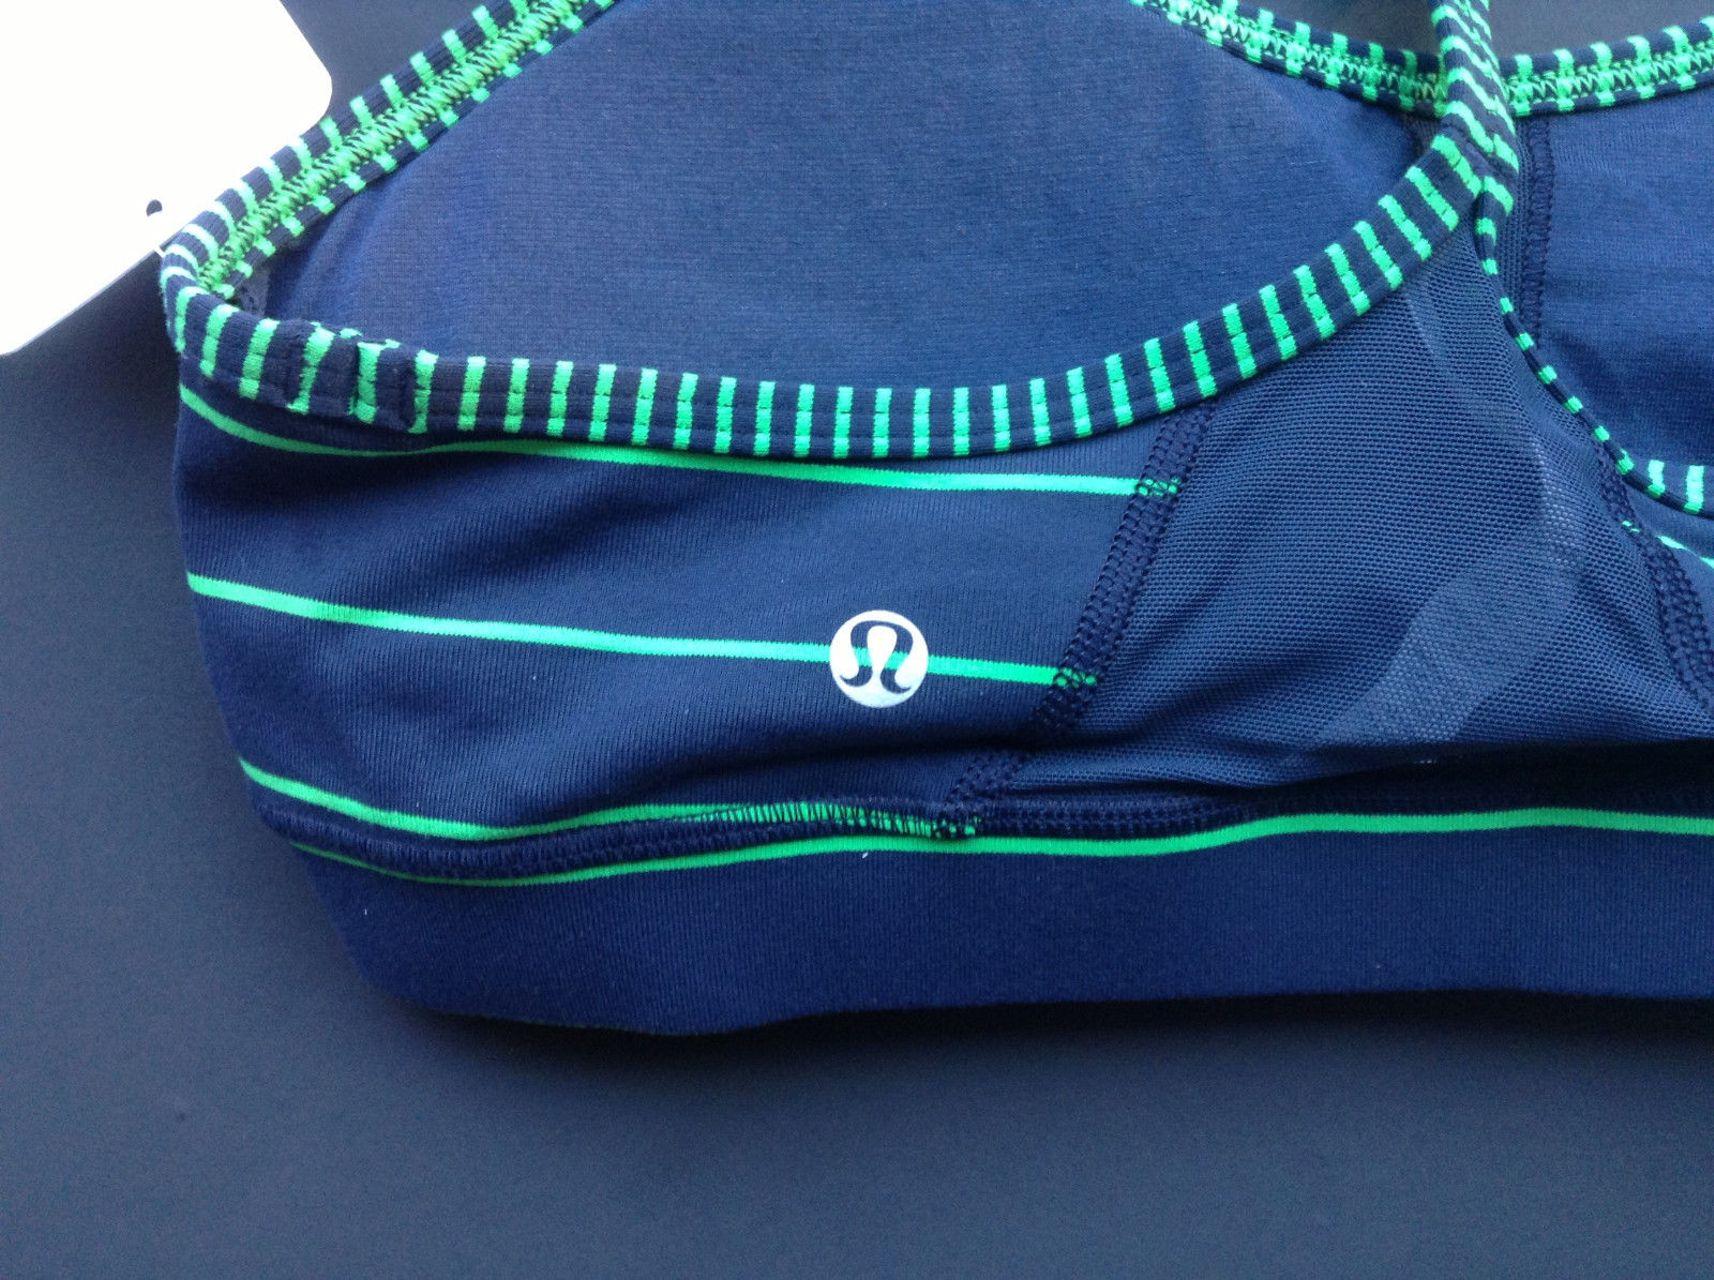 Lululemon Flow Y Bra IV - Slalom Stripe Inkwell / Hyper Stripe Green Bean / Inkwell